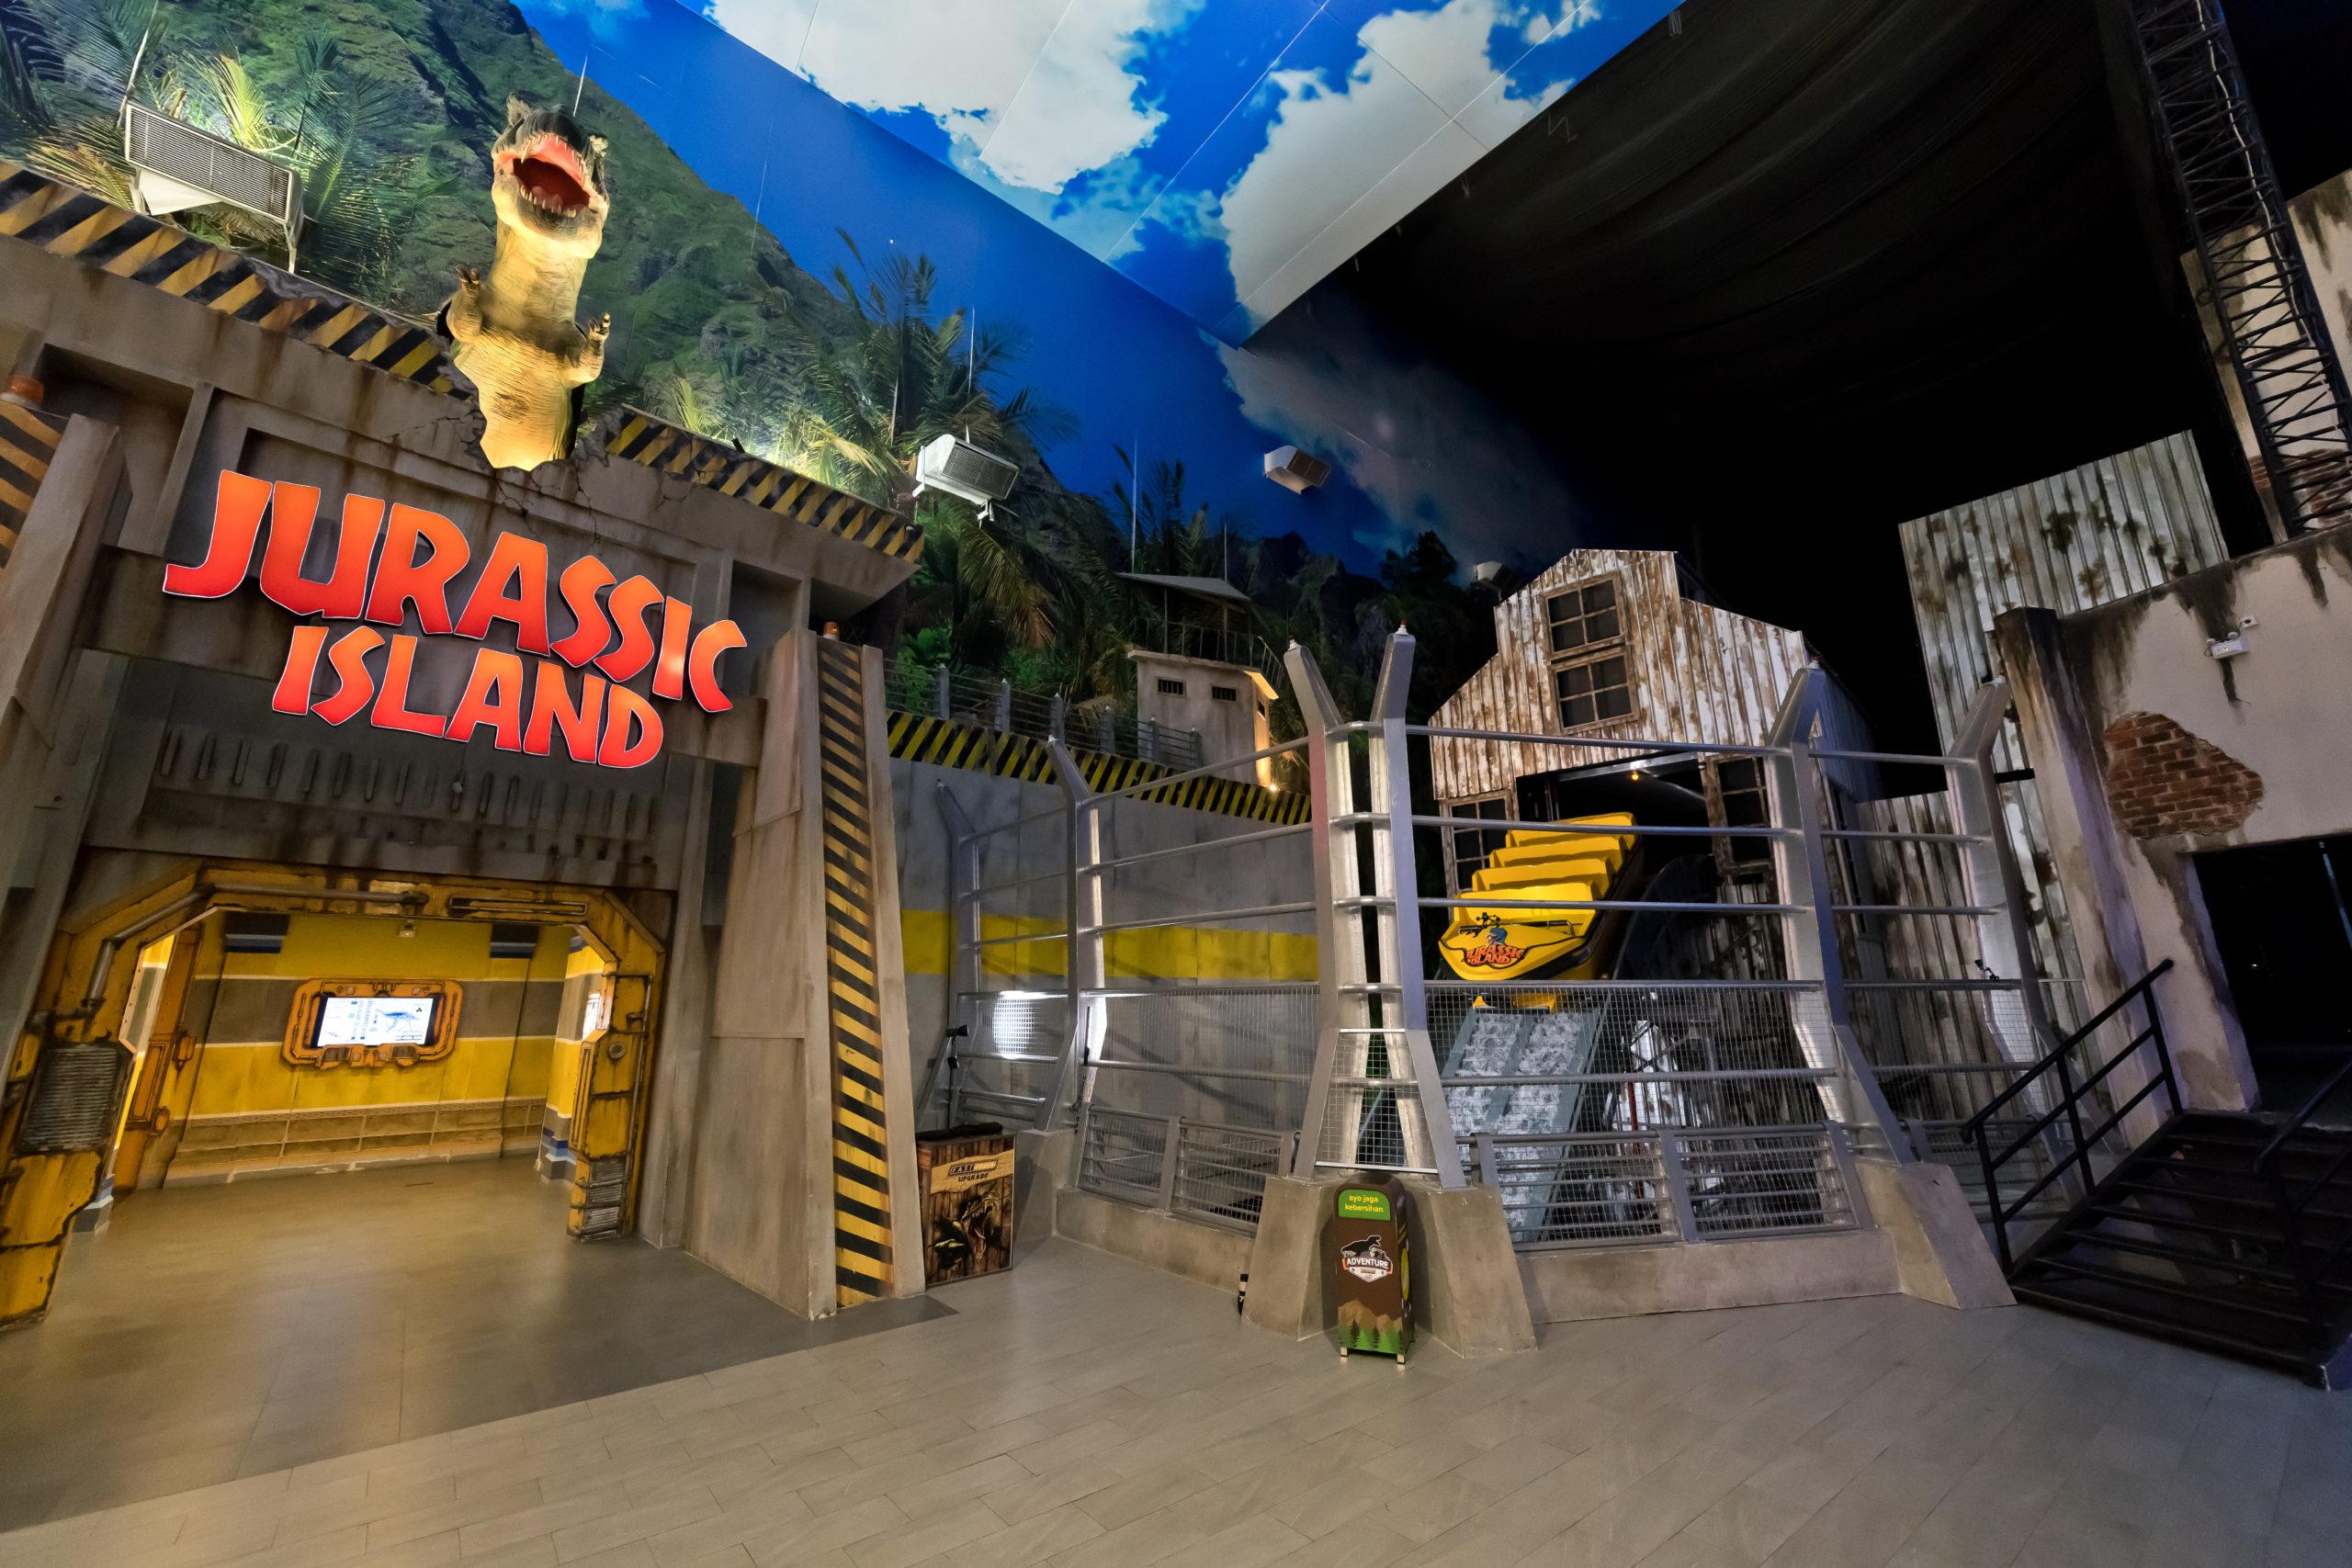 Interlink New Ride : Immersive Superflume Jurassic Island at Trans Studio Cibubur outside